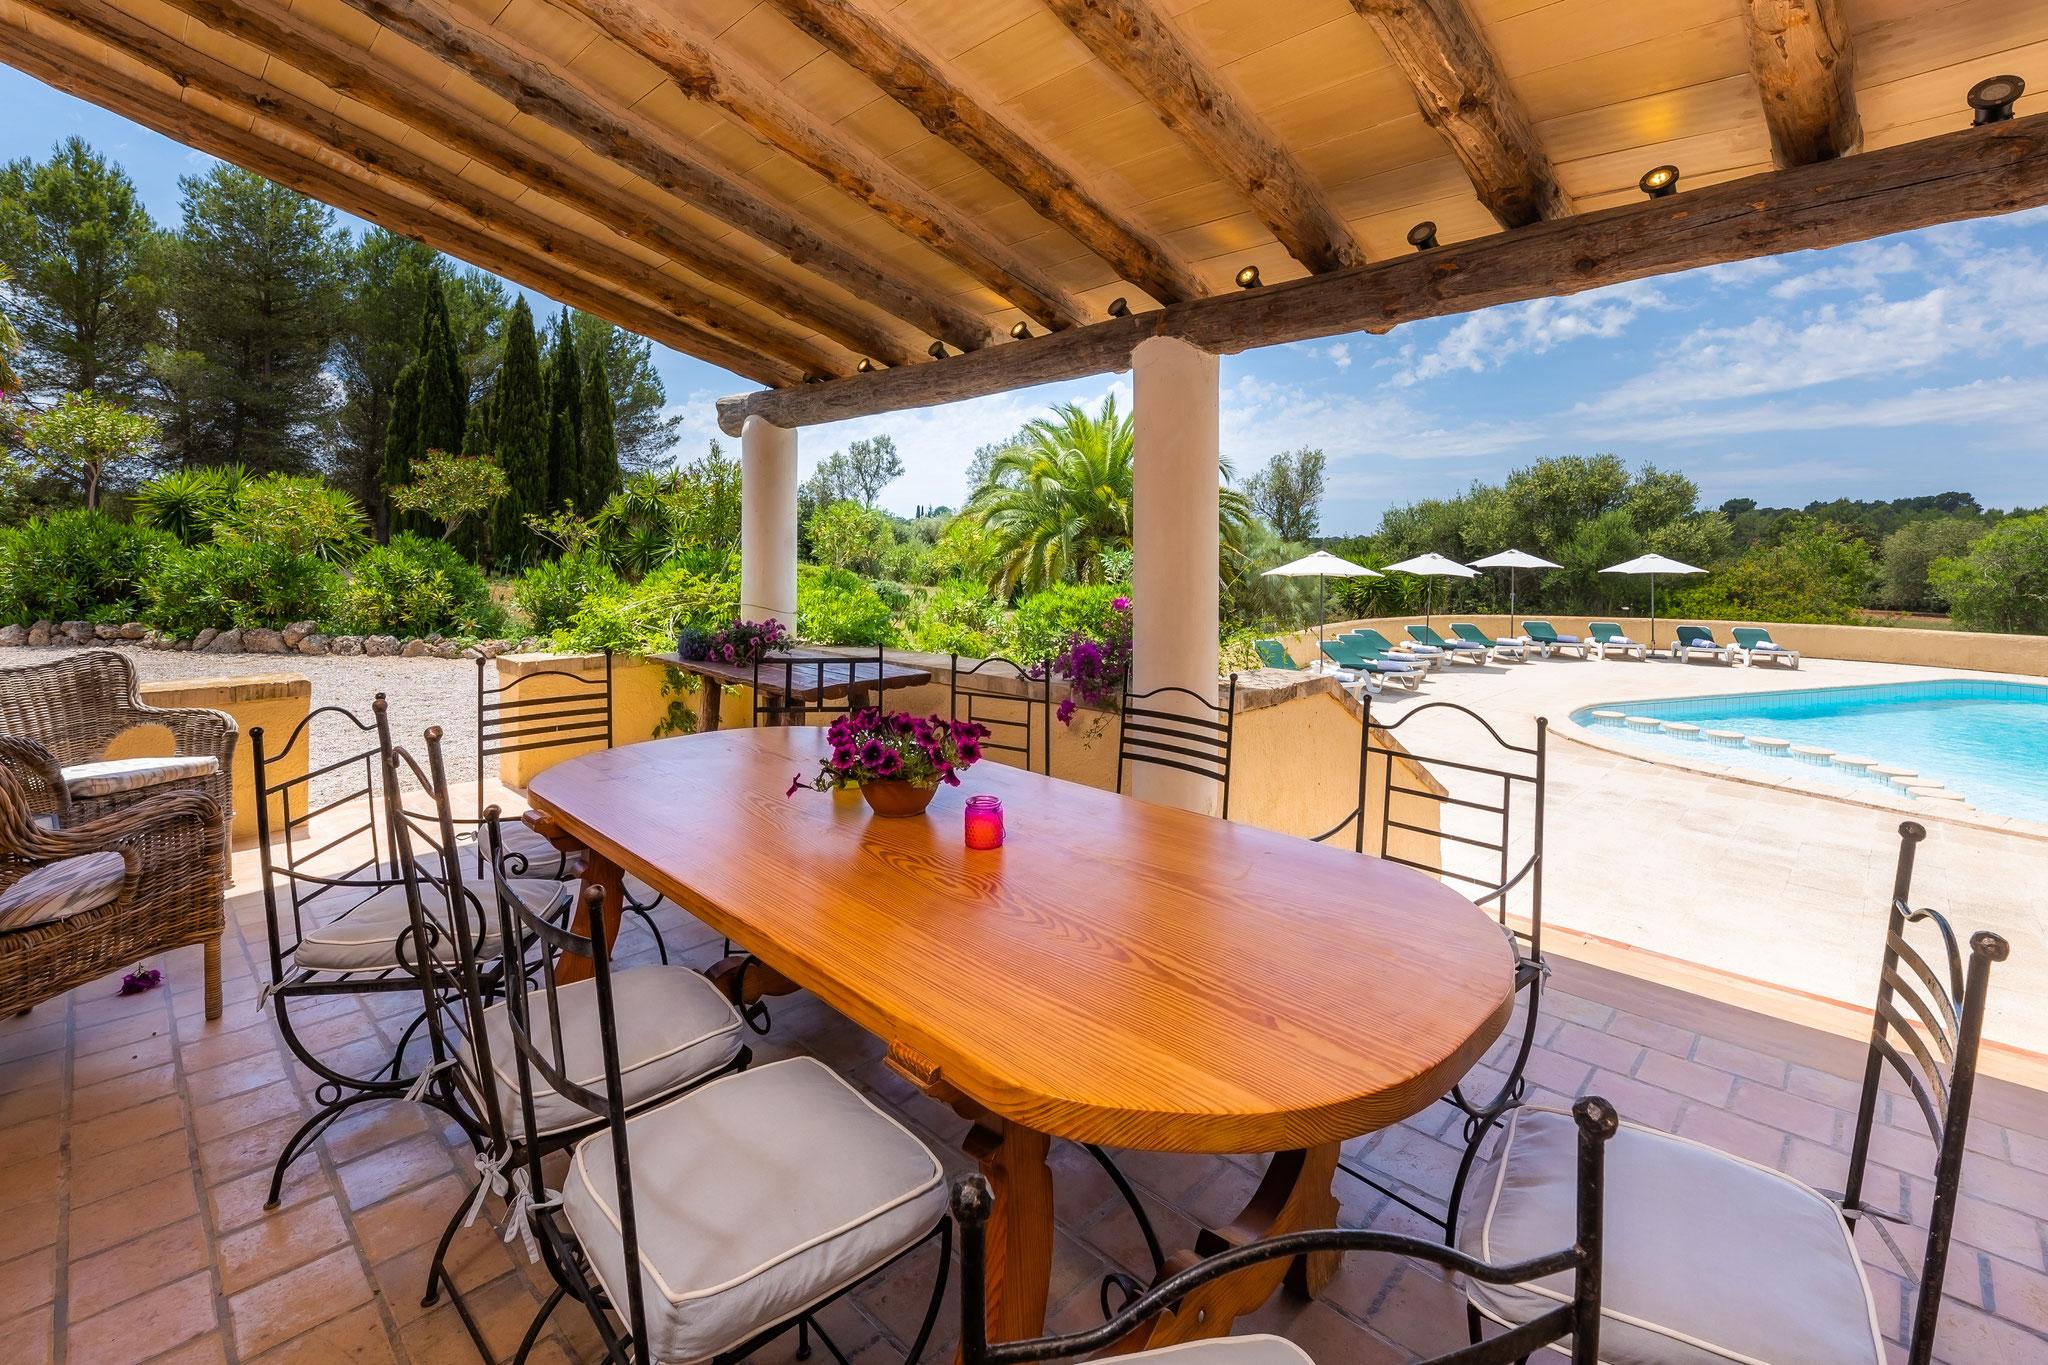 Terrasse mit Poolzugang